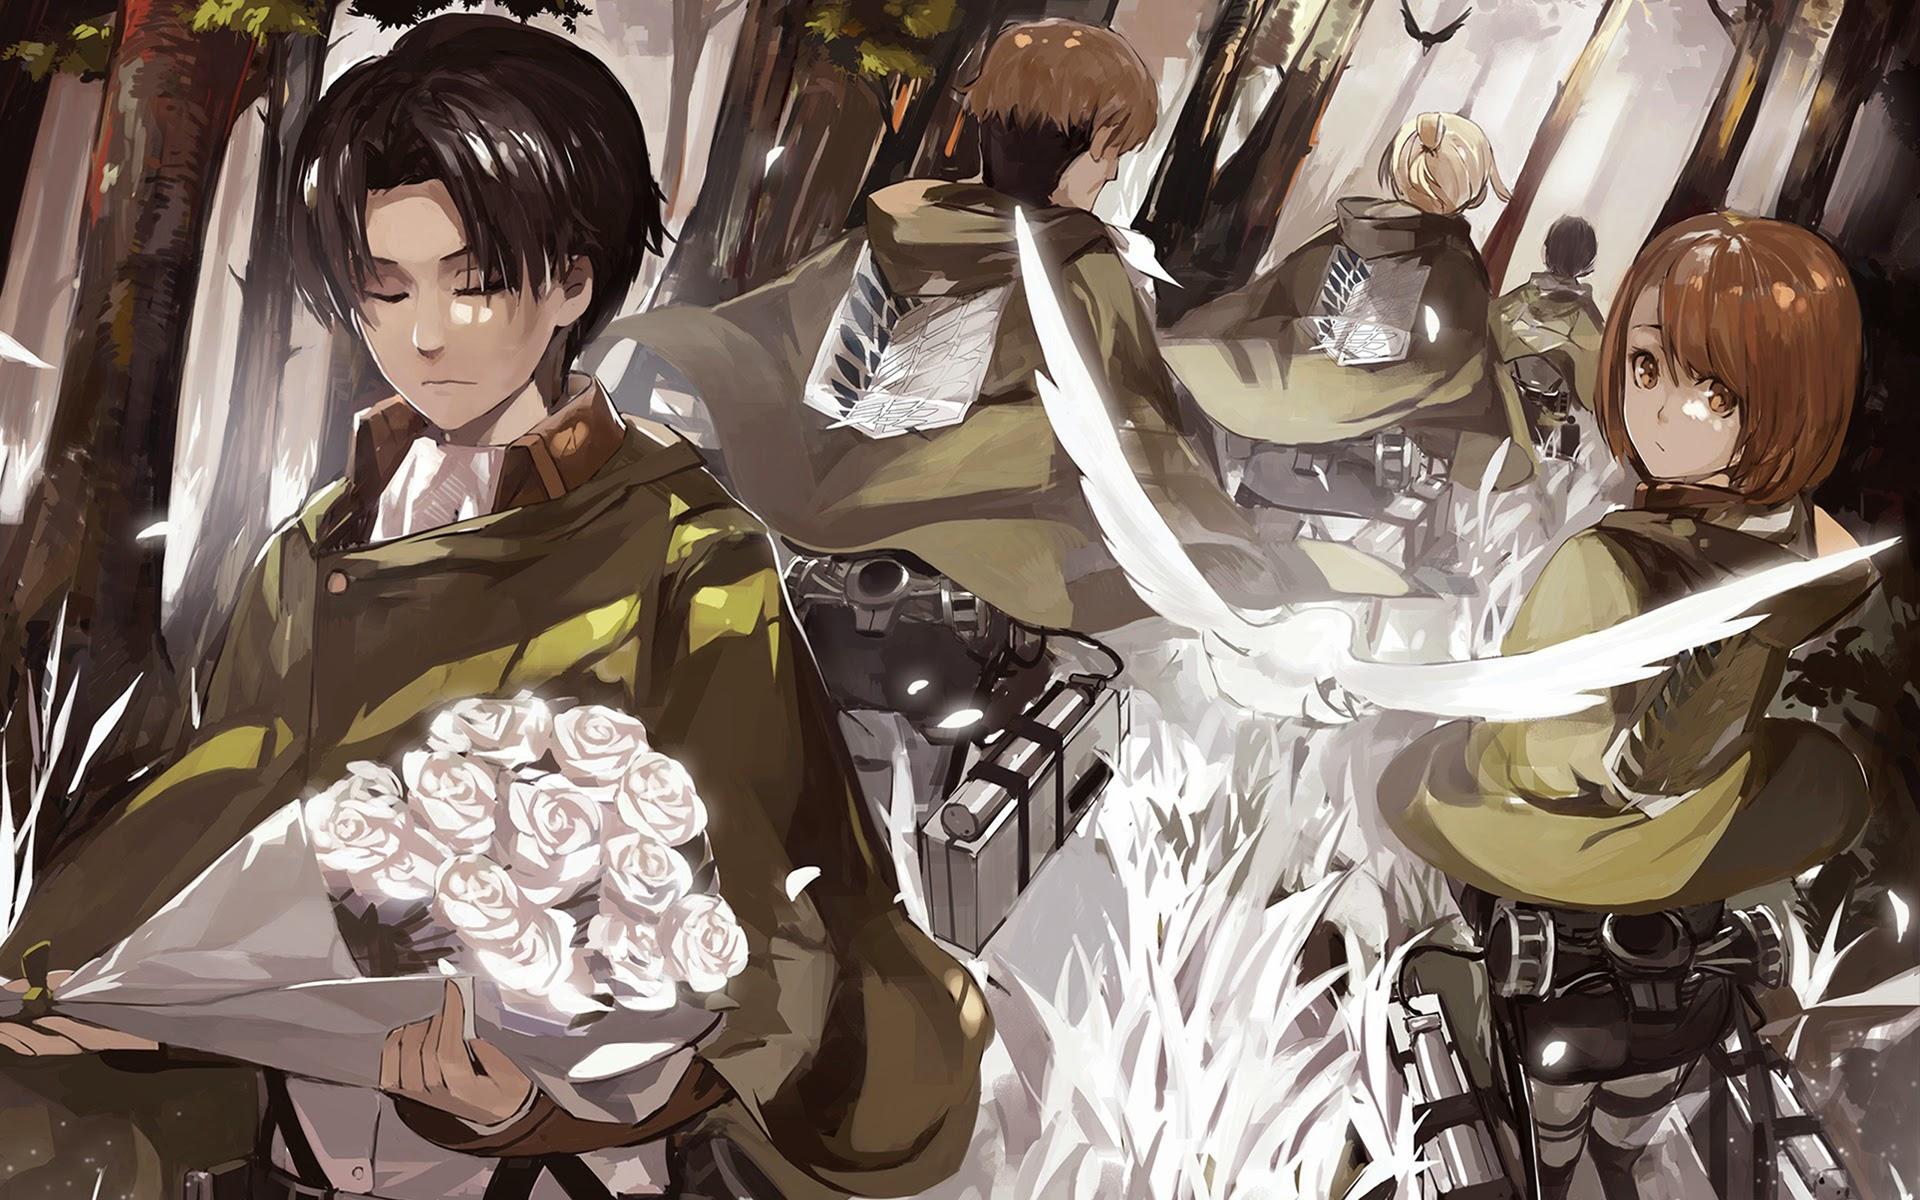 Free Download Levi Special Squad Anime Attack On Titan Shingeki No Kyojin Hd 1920x1200 For Your Desktop Mobile Tablet Explore 50 Levi Attack On Titan Wallpaper Aot Levi Wallpaper